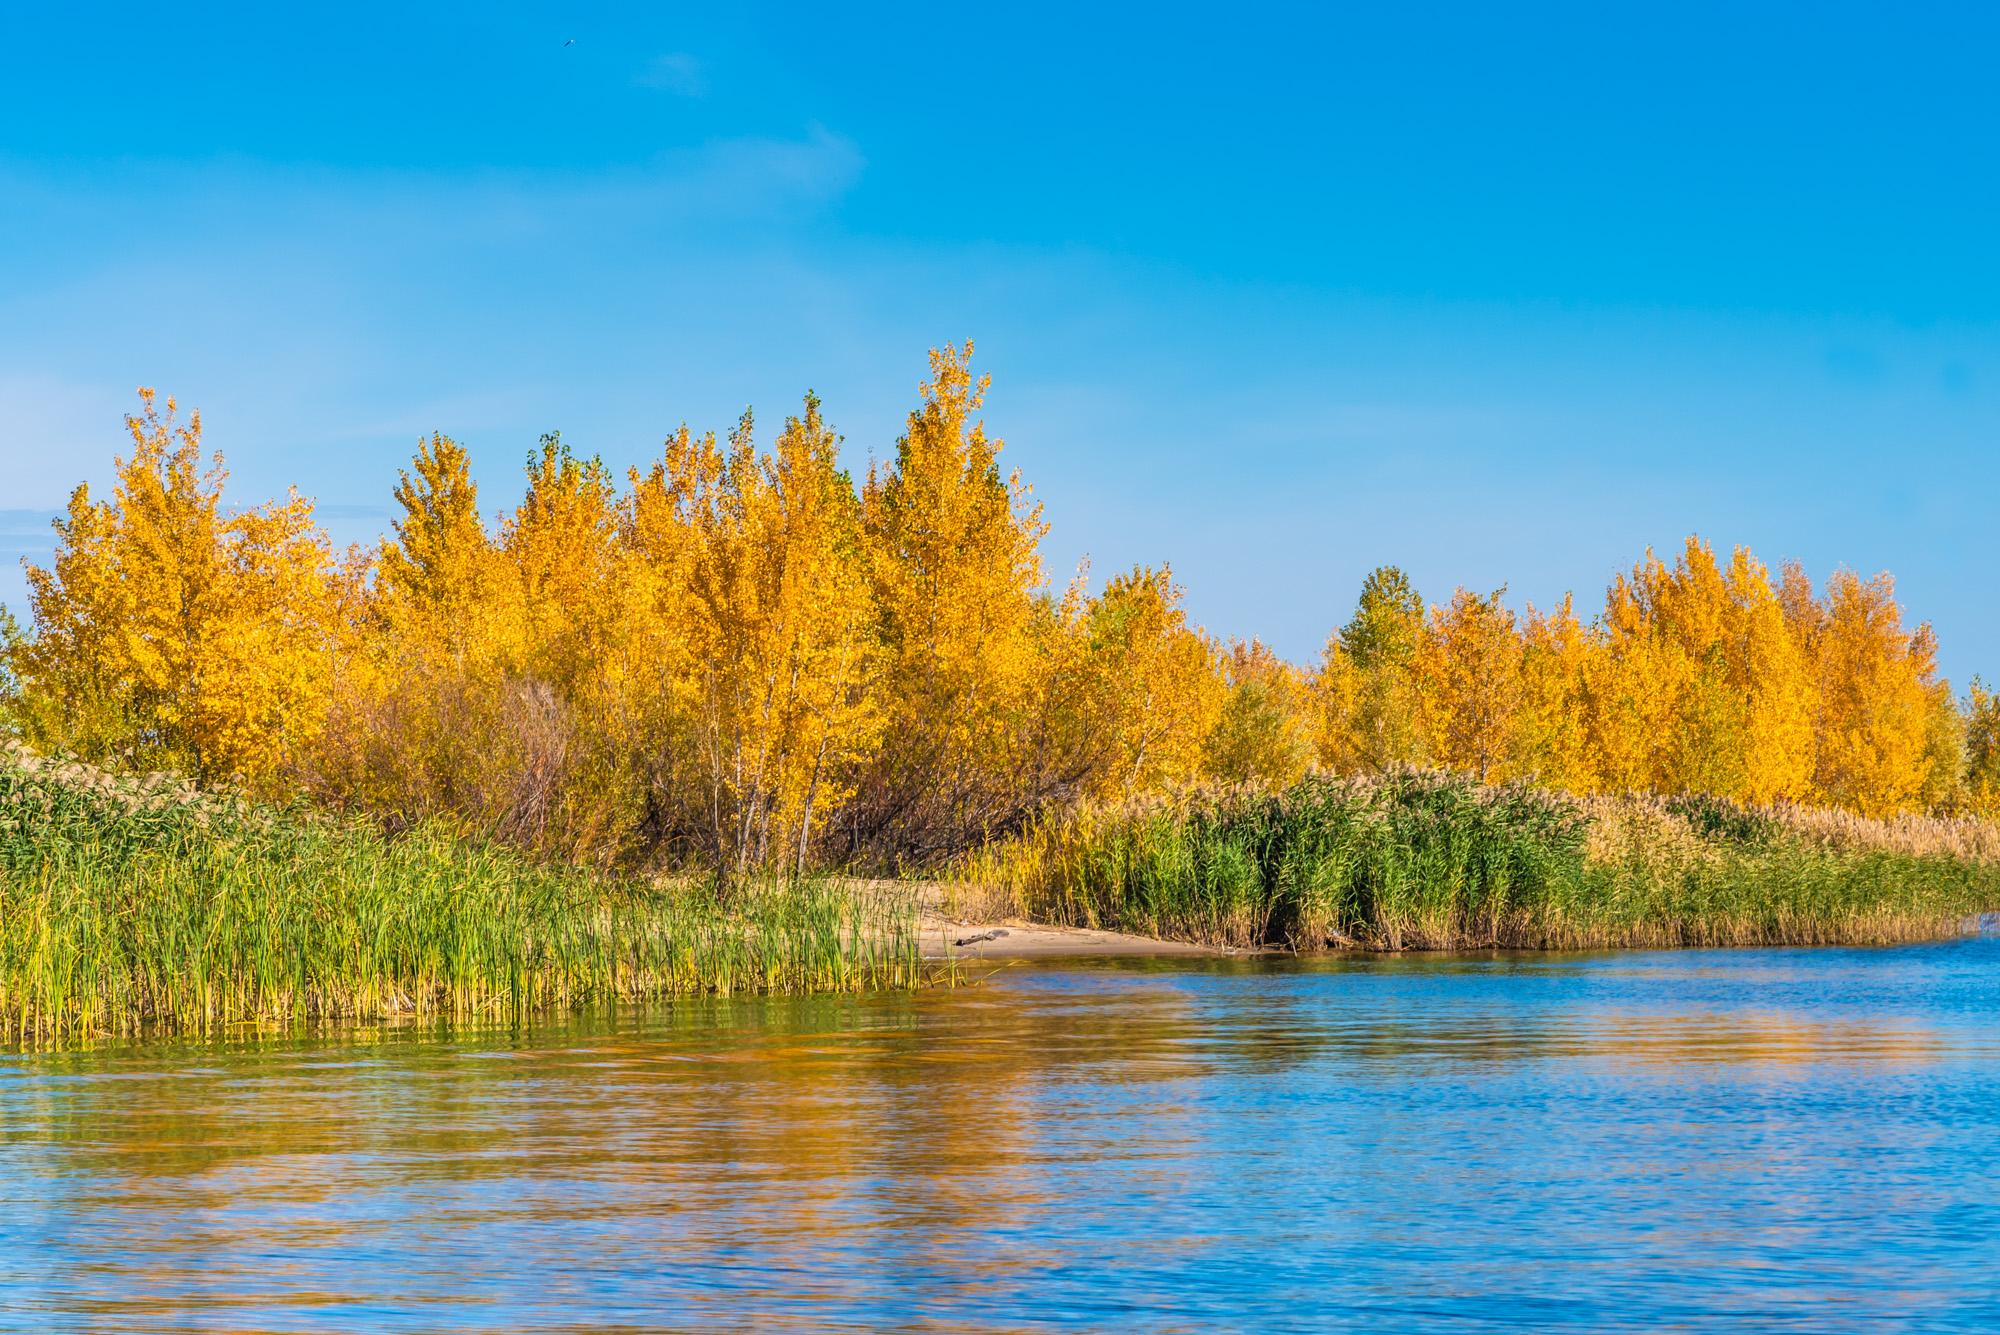 речной осенний пейзаж